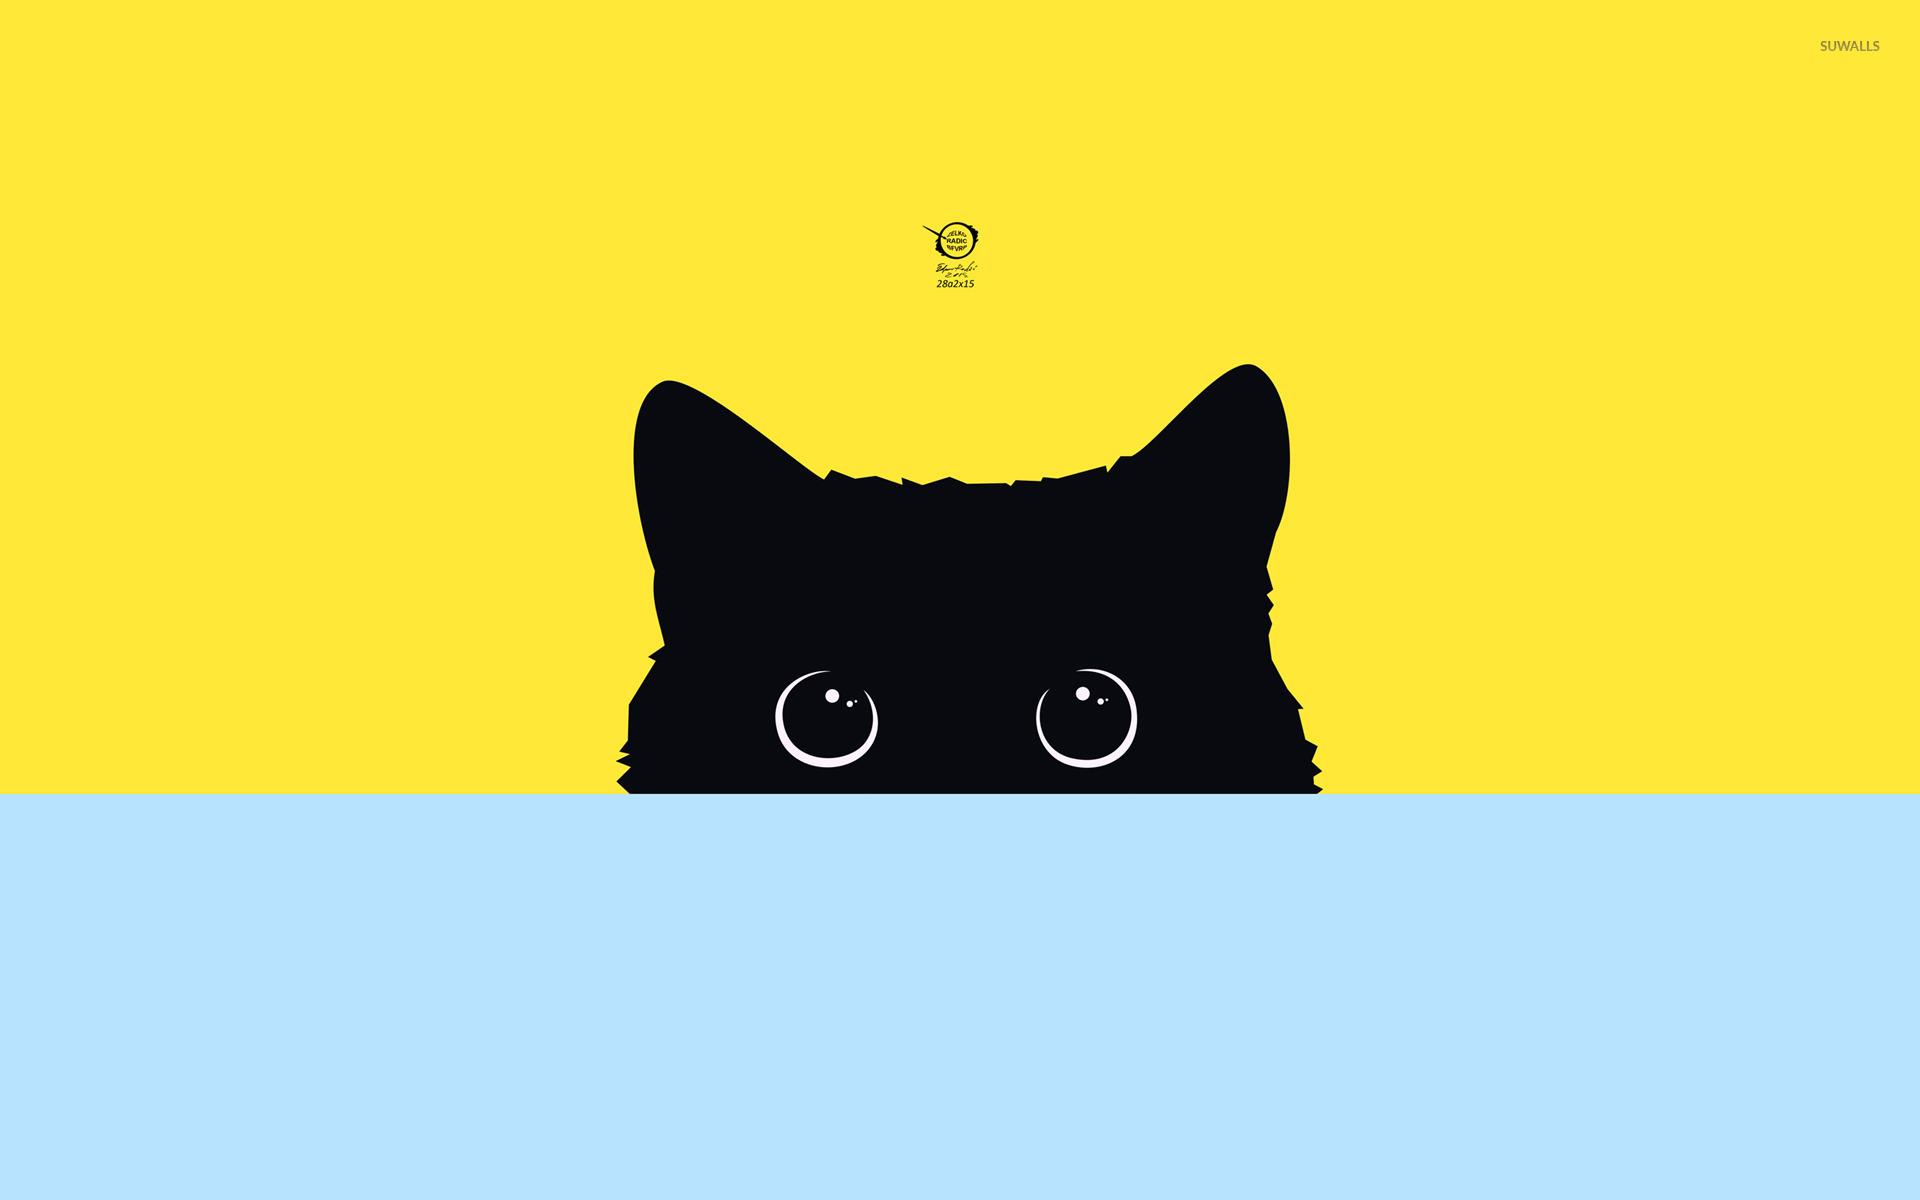 Cute Minimalistic Wallpapers Black Cat Hiding Wallpaper Vector Wallpapers 49039